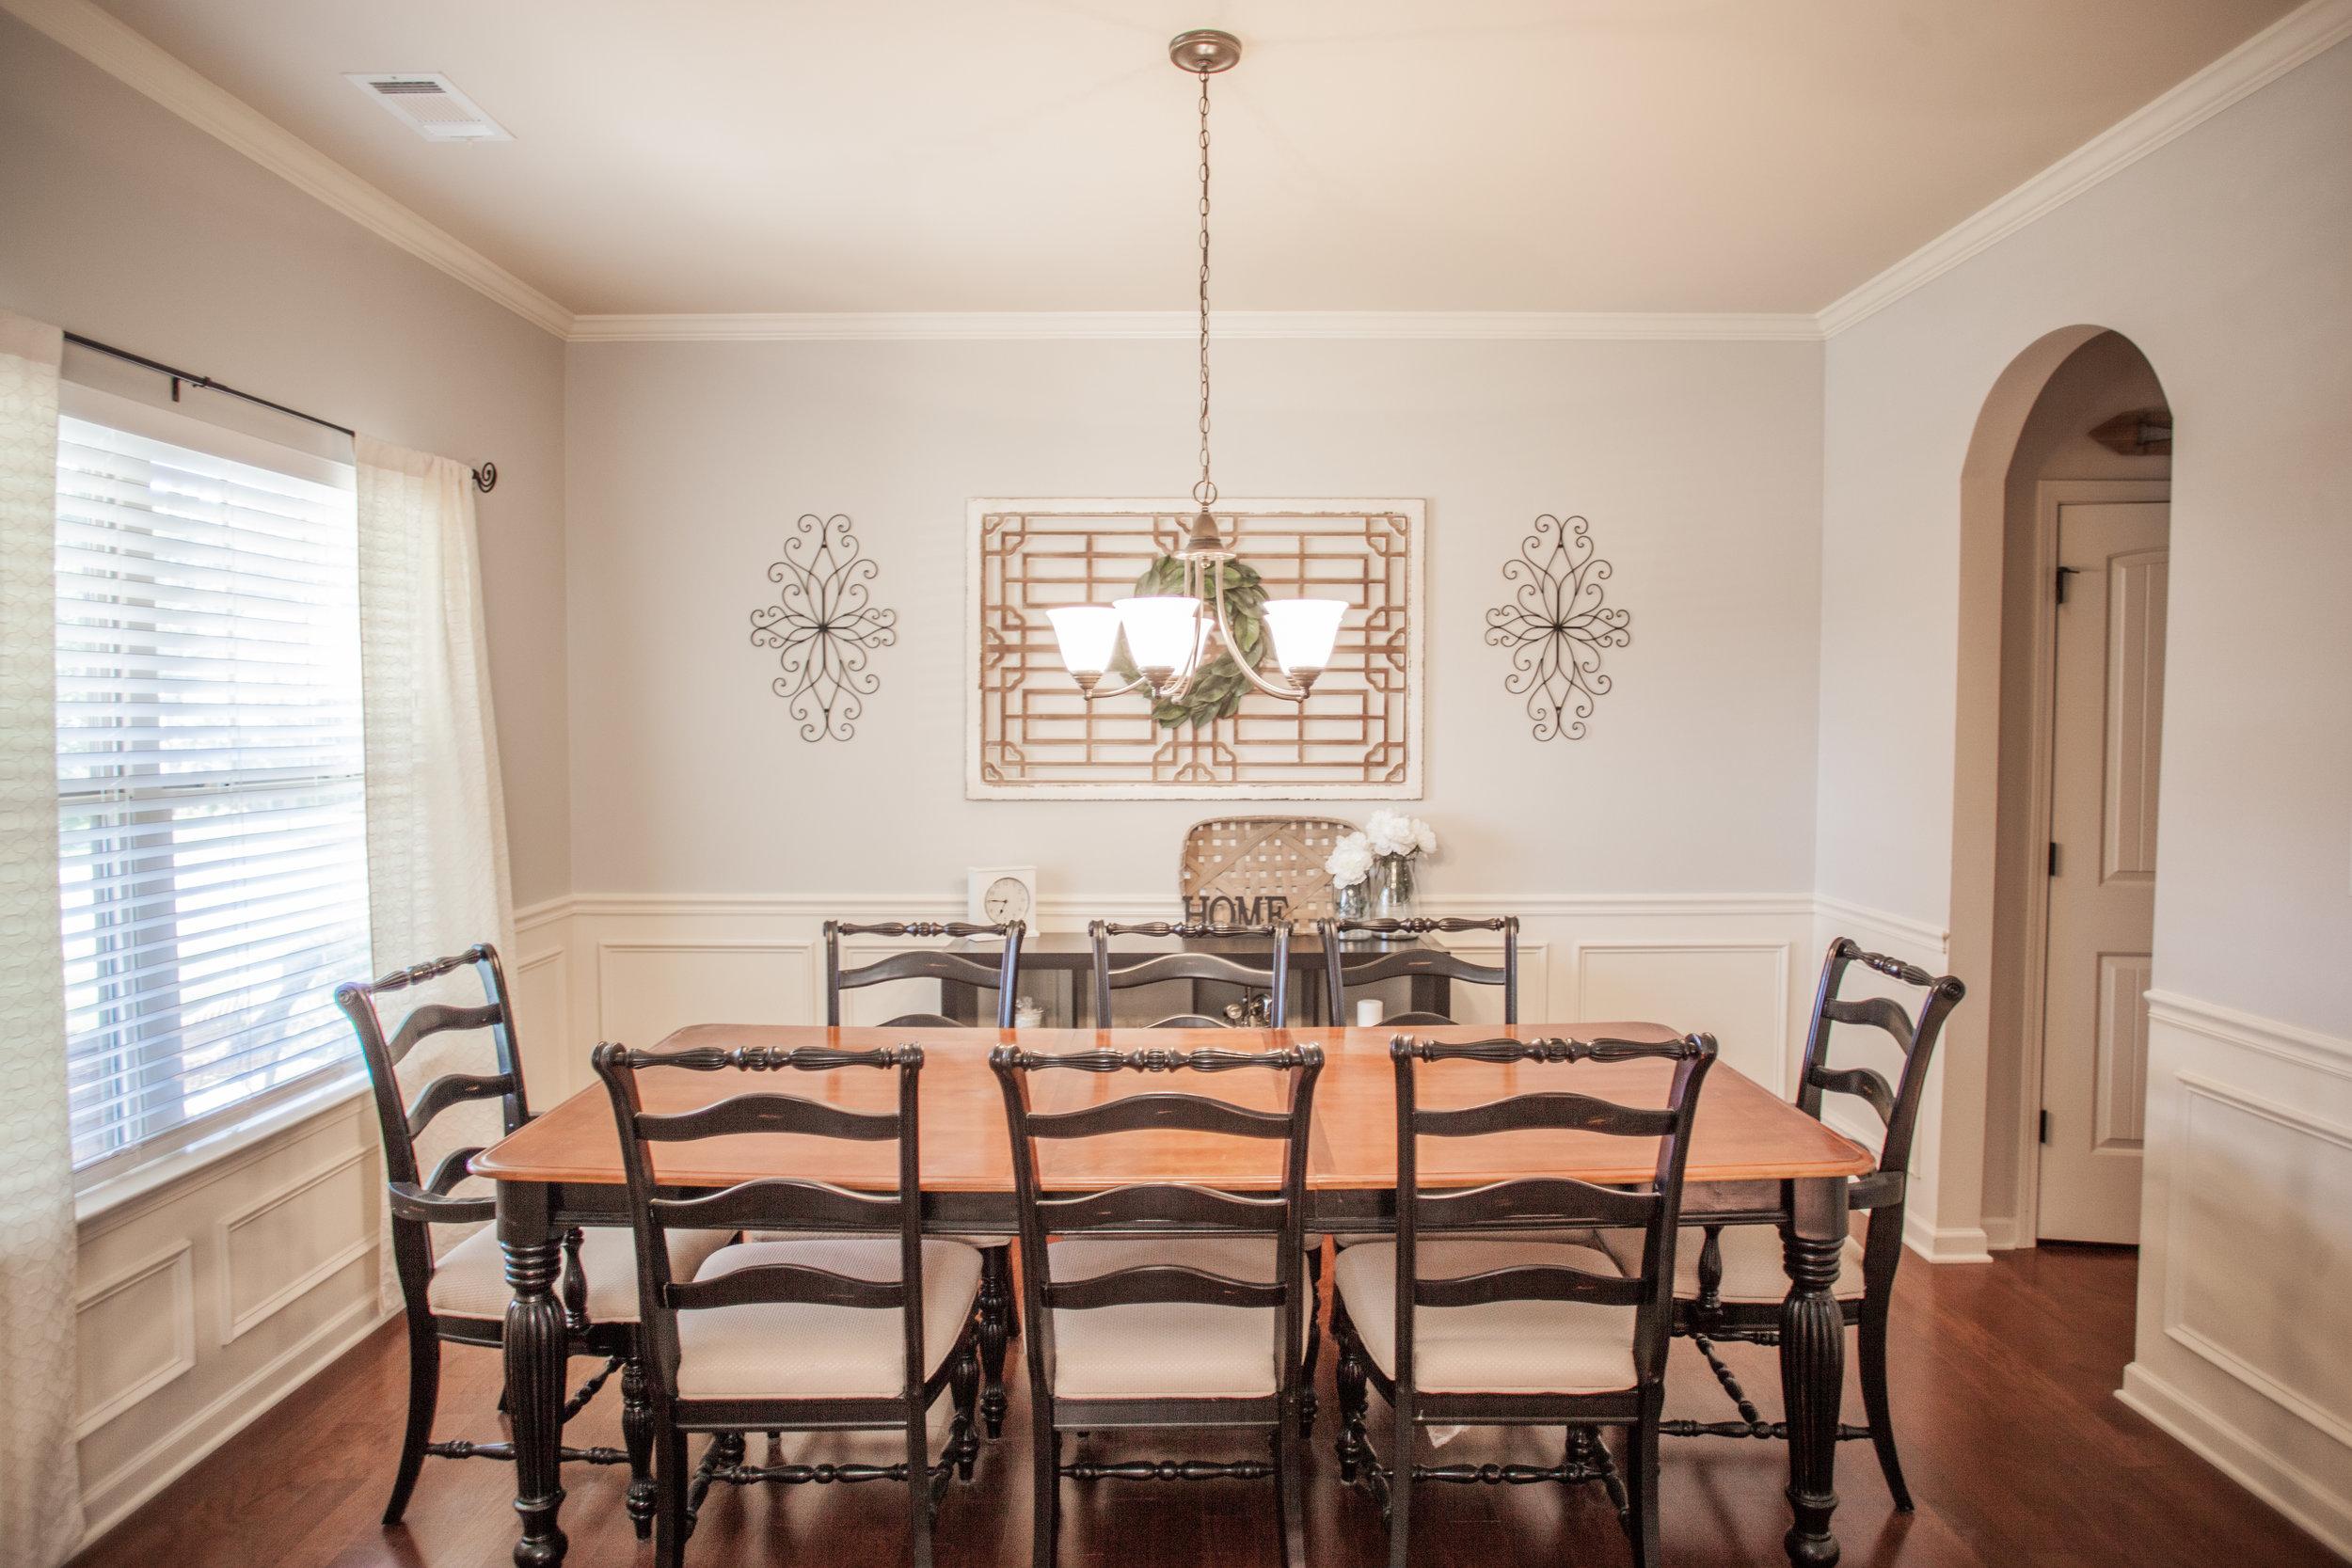 woodstock-ga-house-for-sale-wingard-real-estate-under-300k-35.jpg